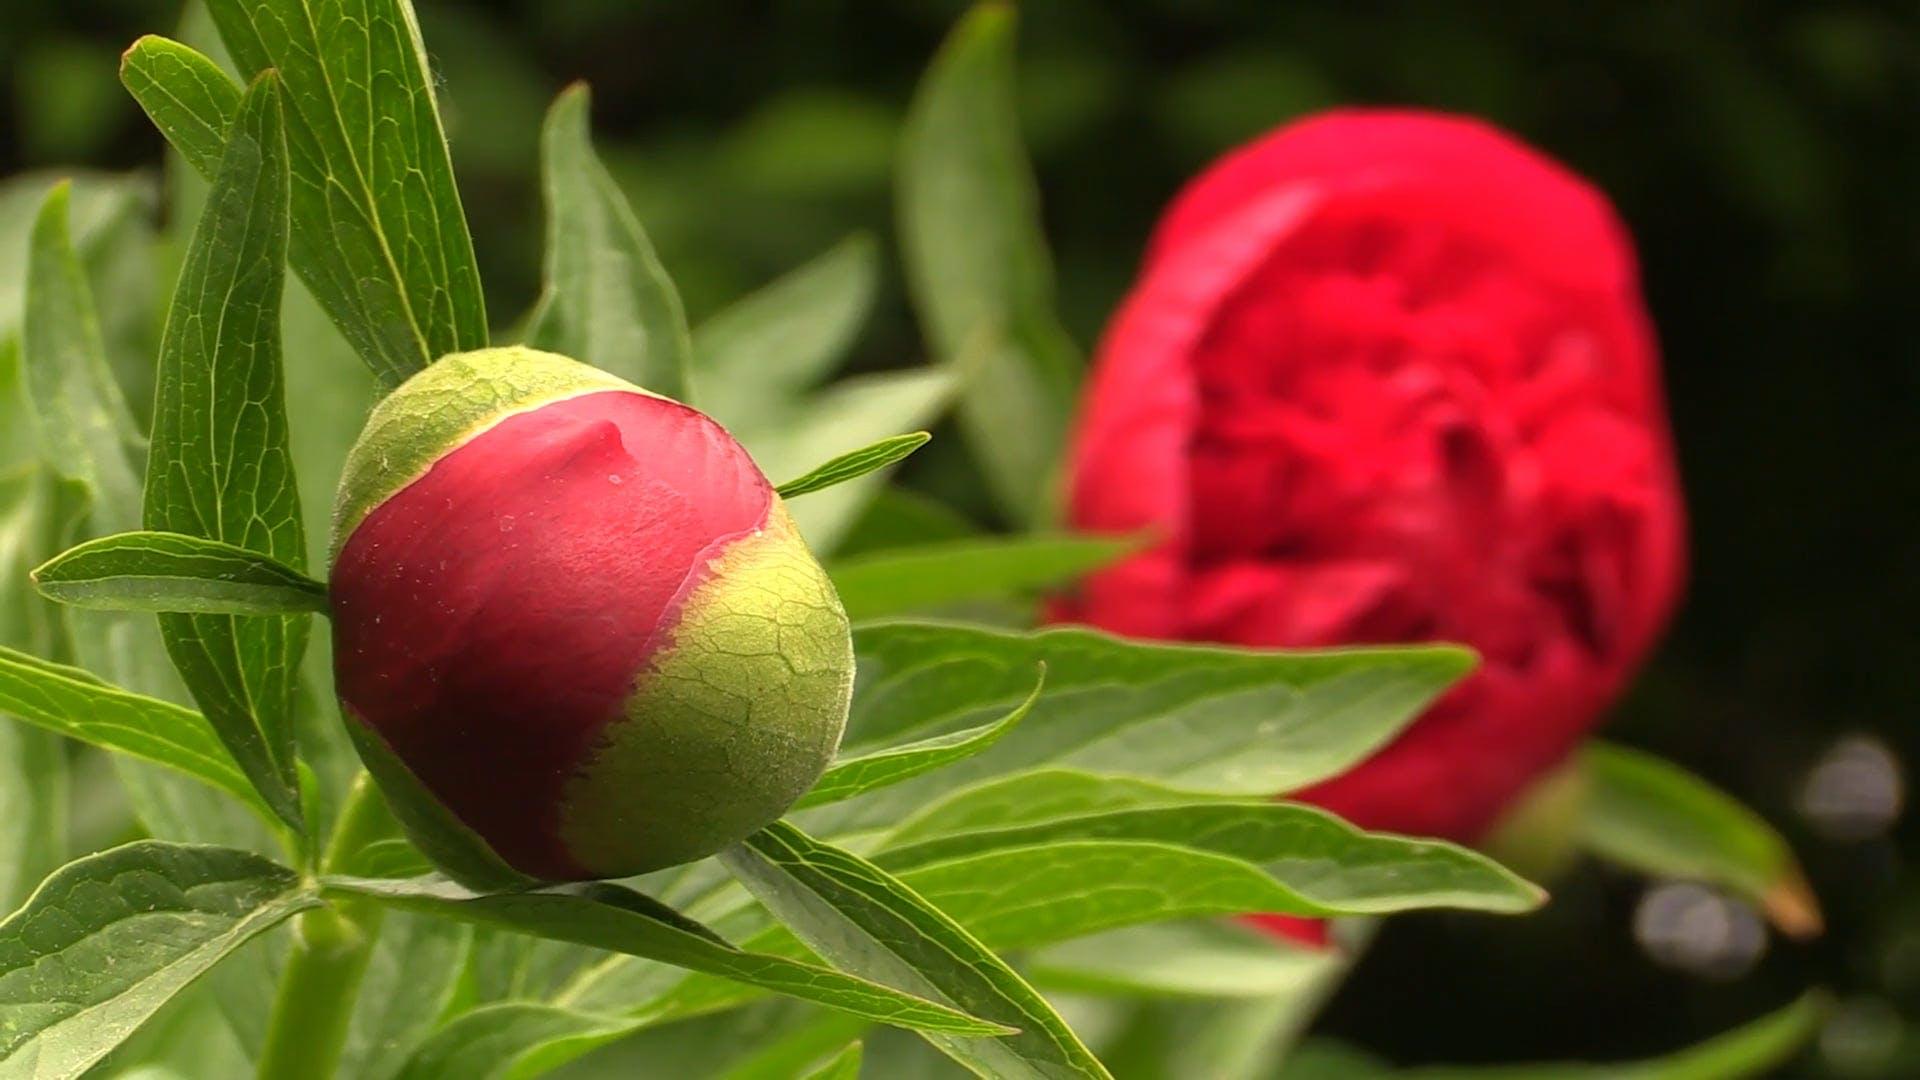 Poppy Flower And Bud Video